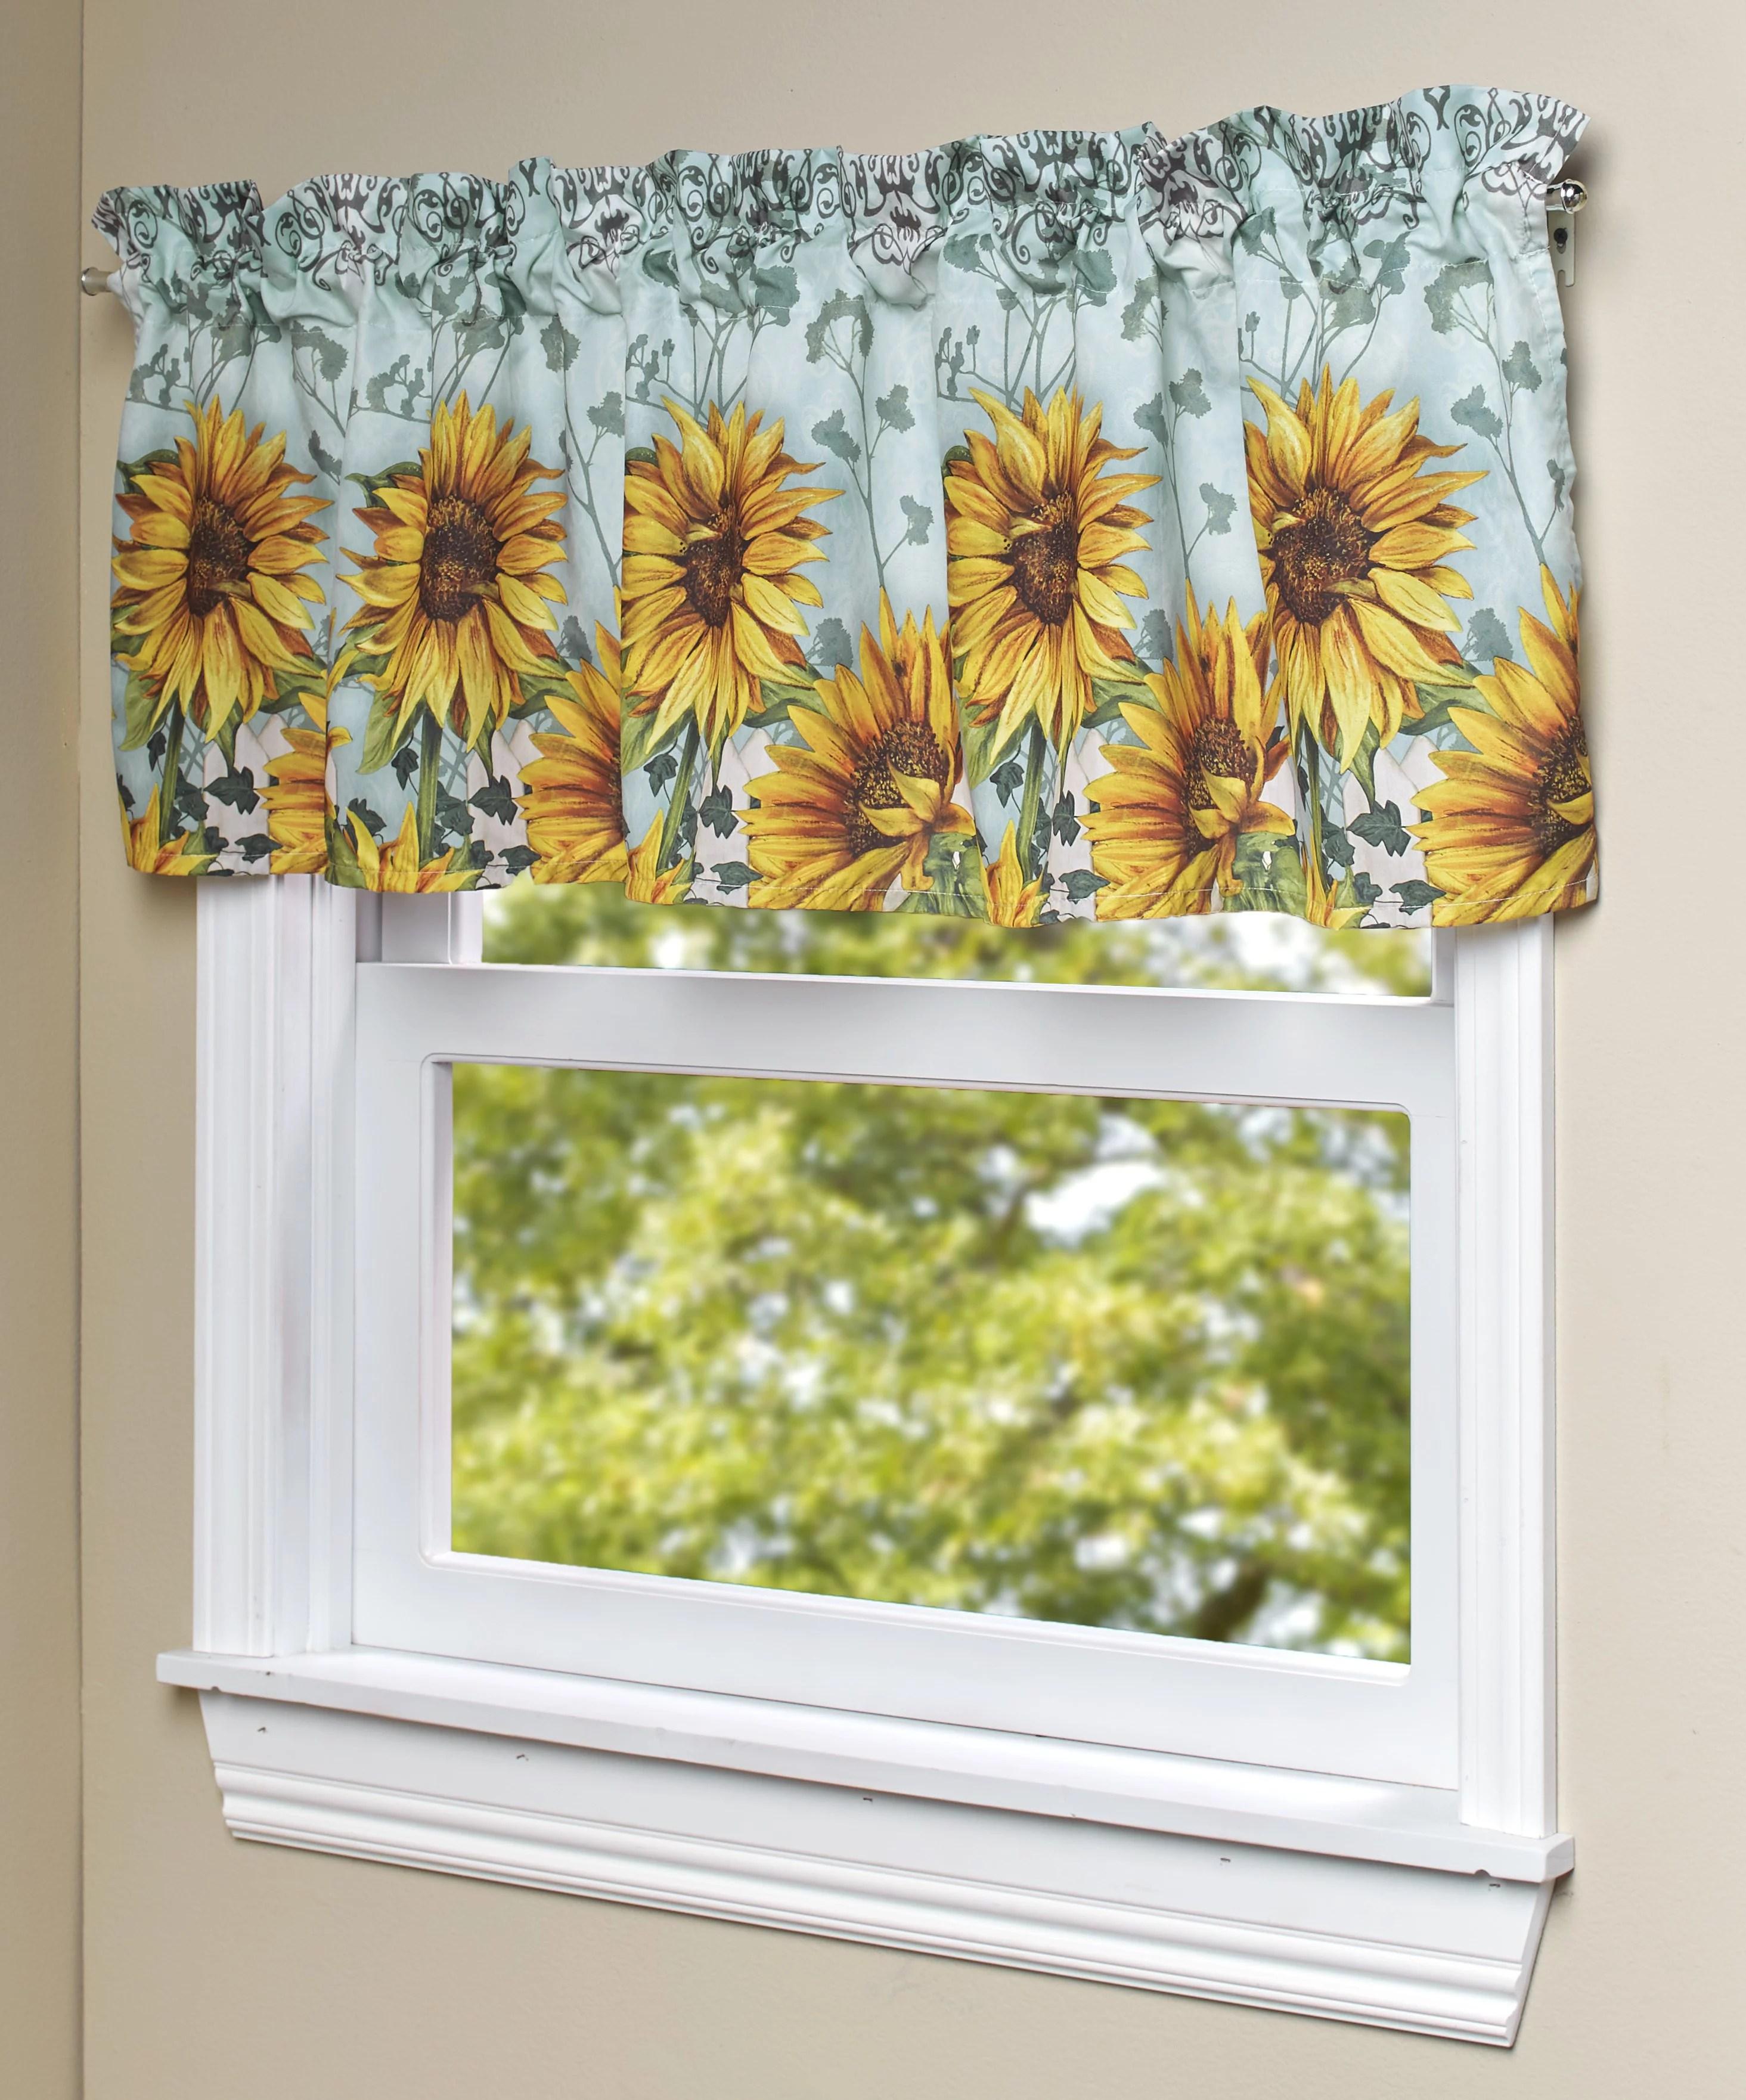 sunflower window valance farmhouse kitchen bathroom curtain with floral print walmart com